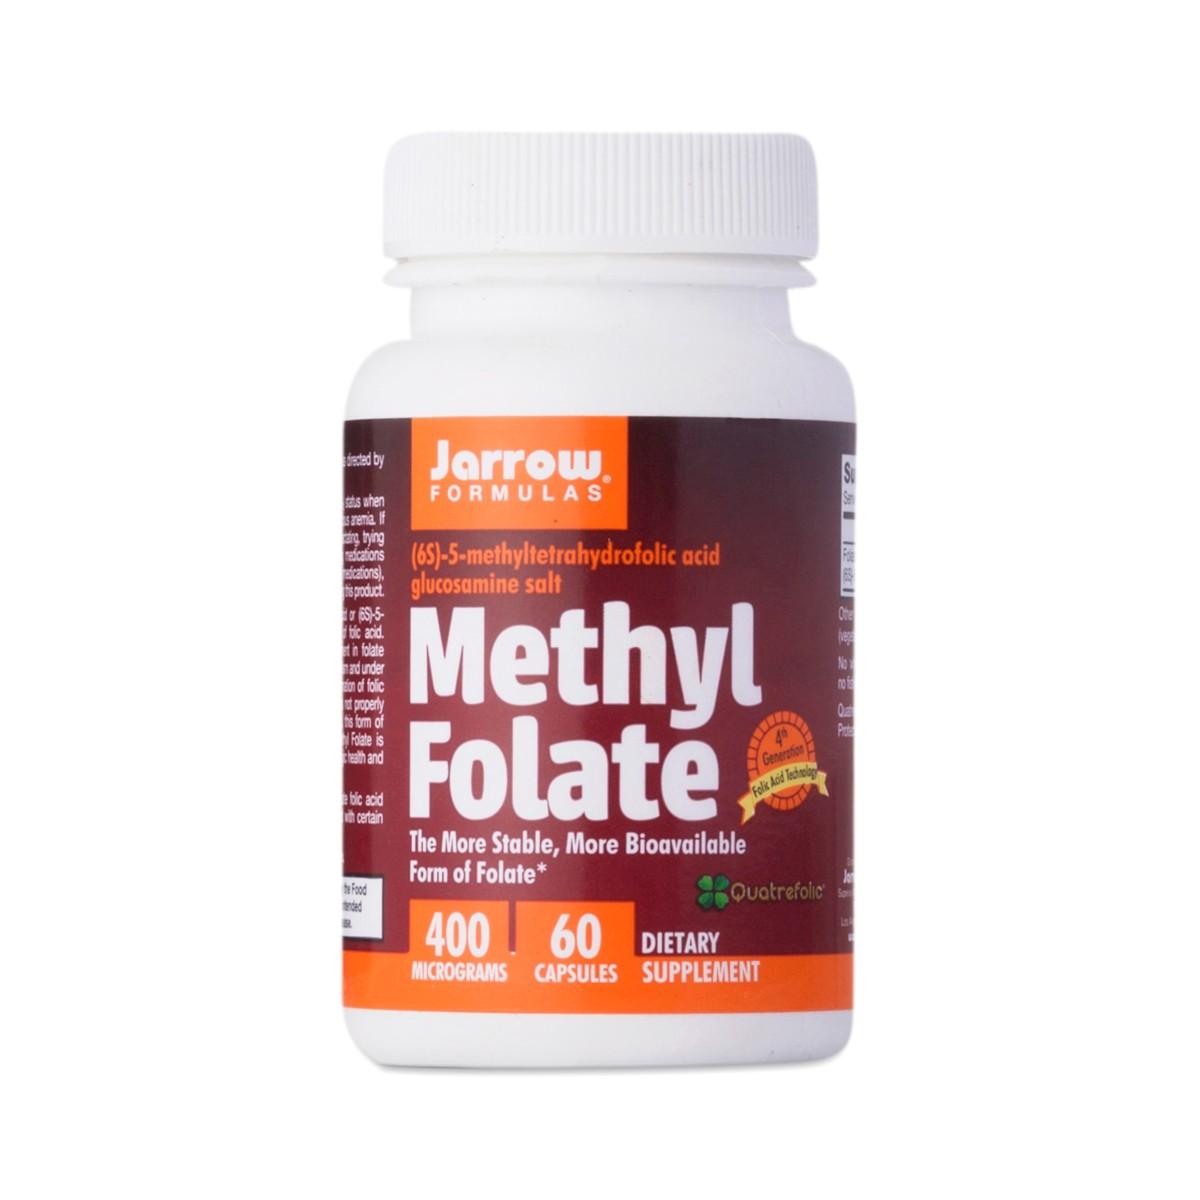 Methyl folate supplement